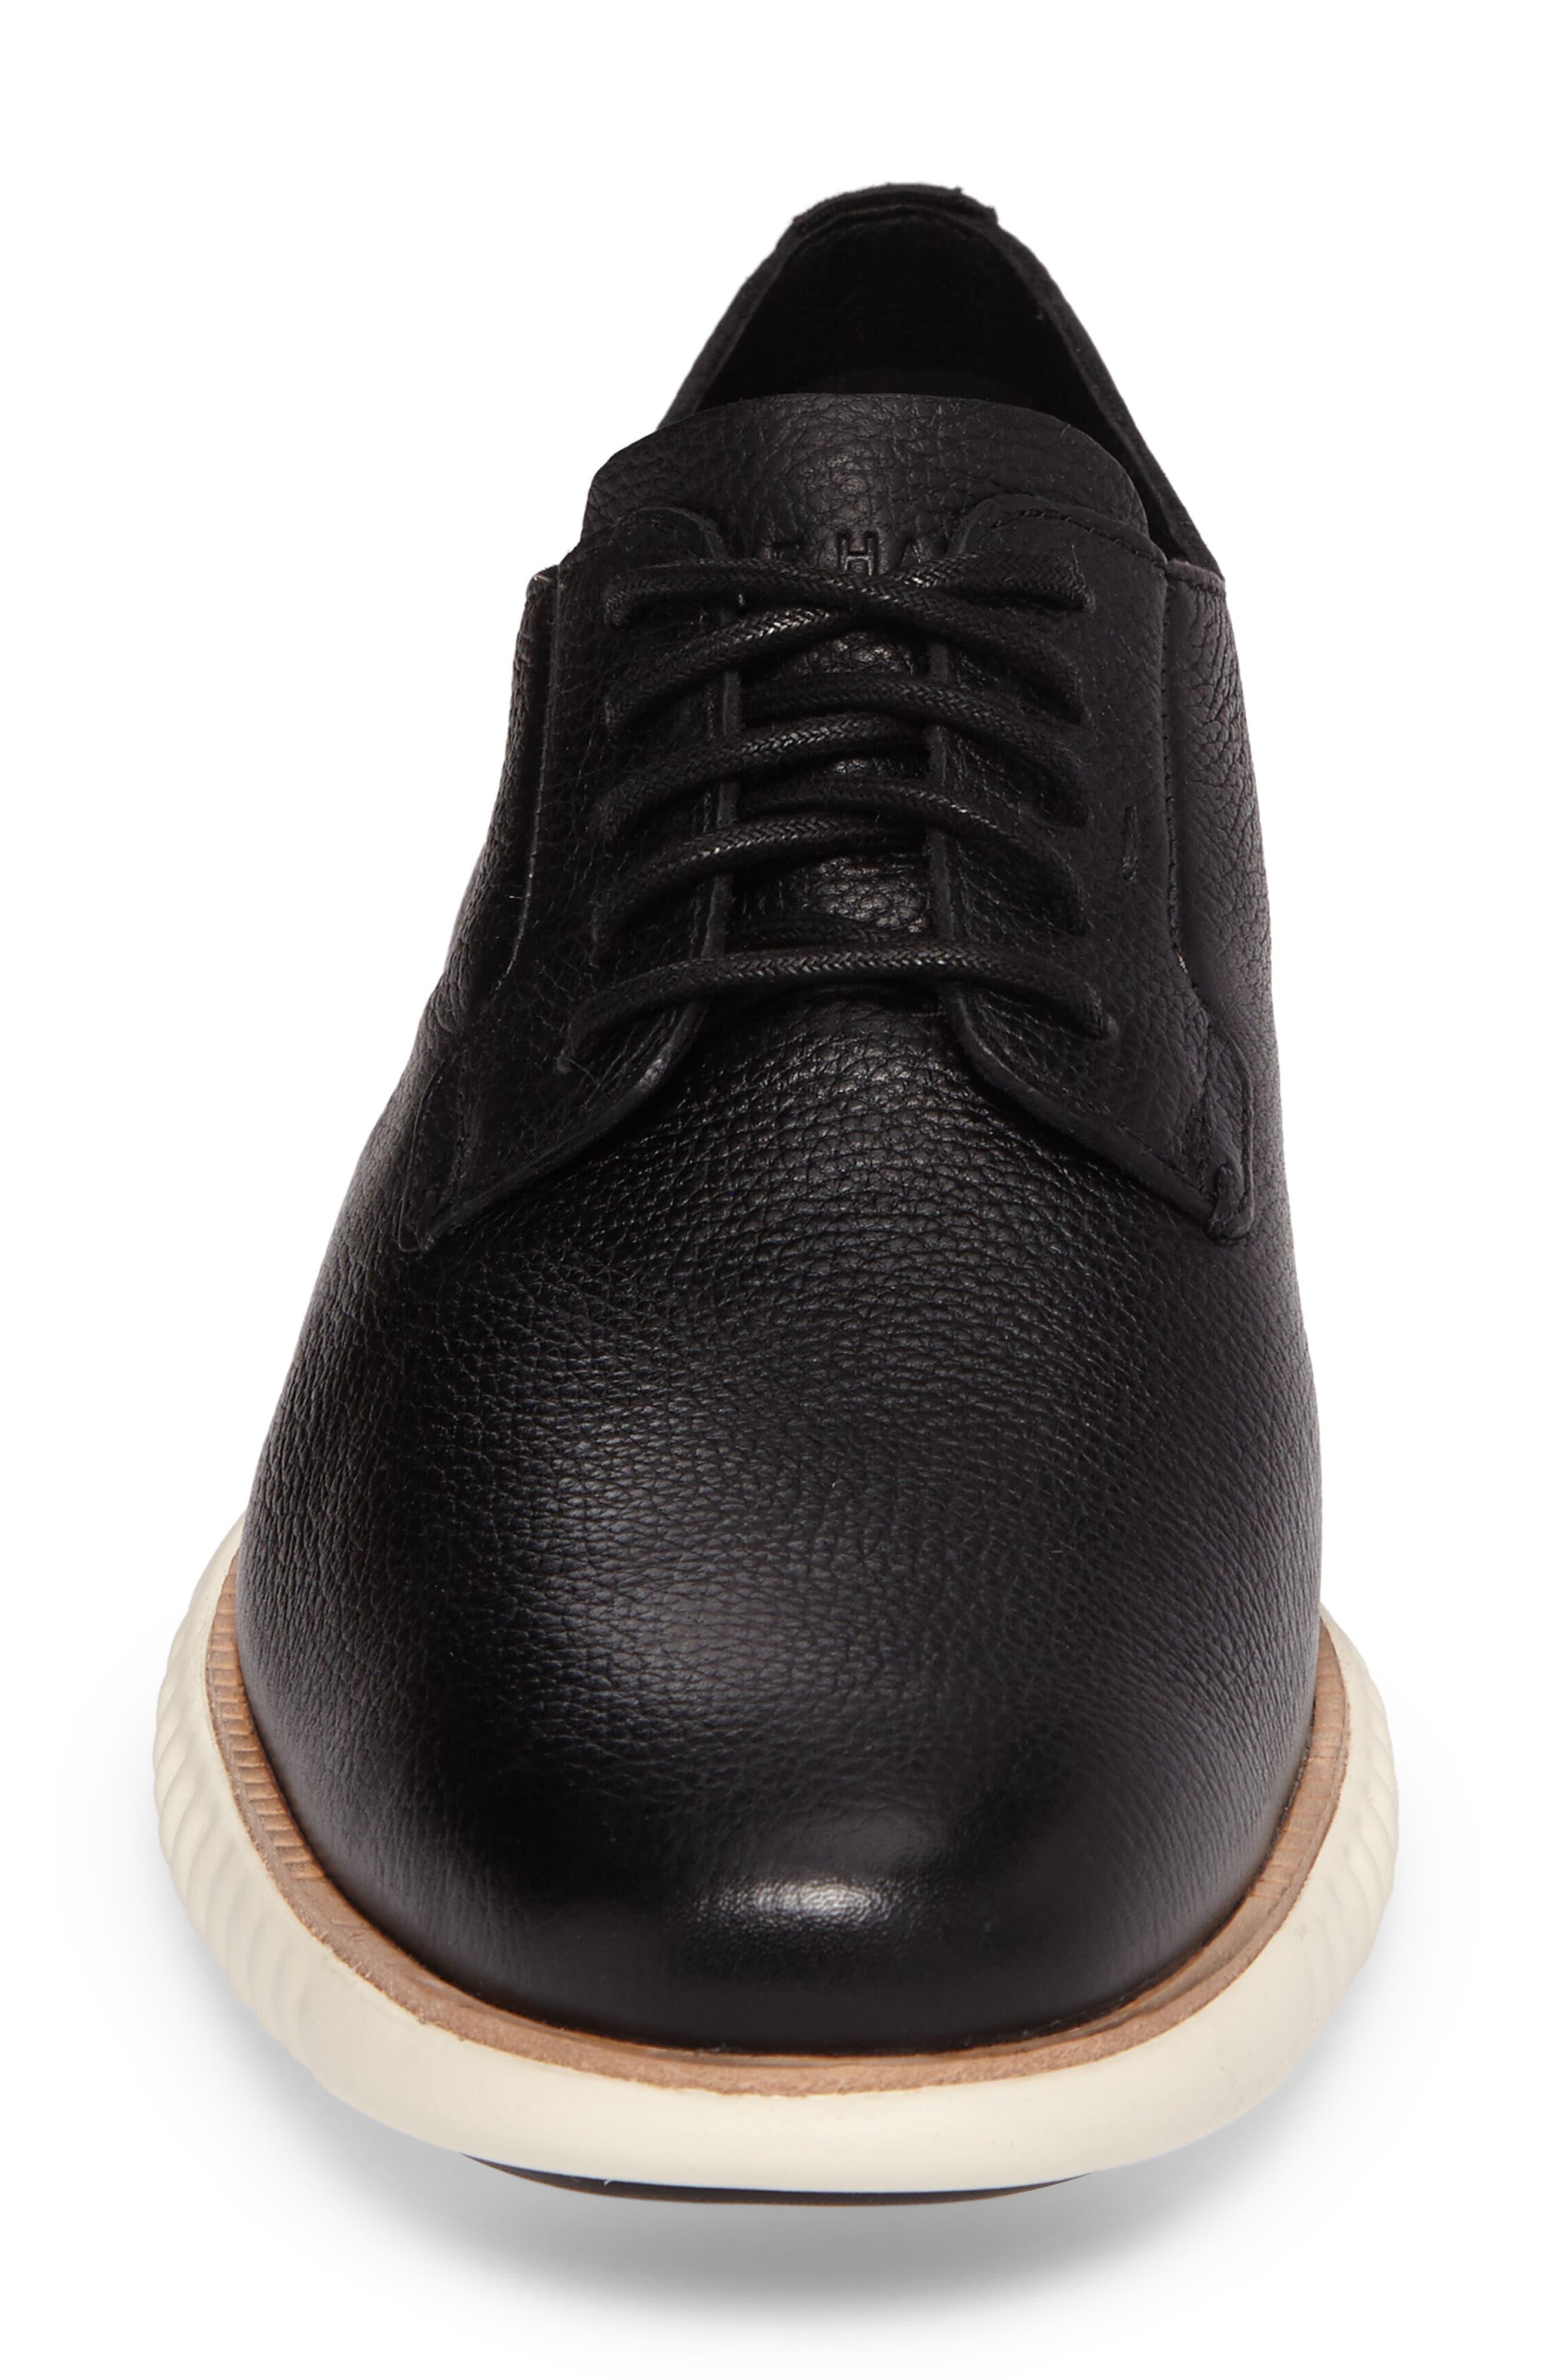 2.ZeroGrand Plain Toe Derby,                             Alternate thumbnail 4, color,                             Black/ Ivory Leather